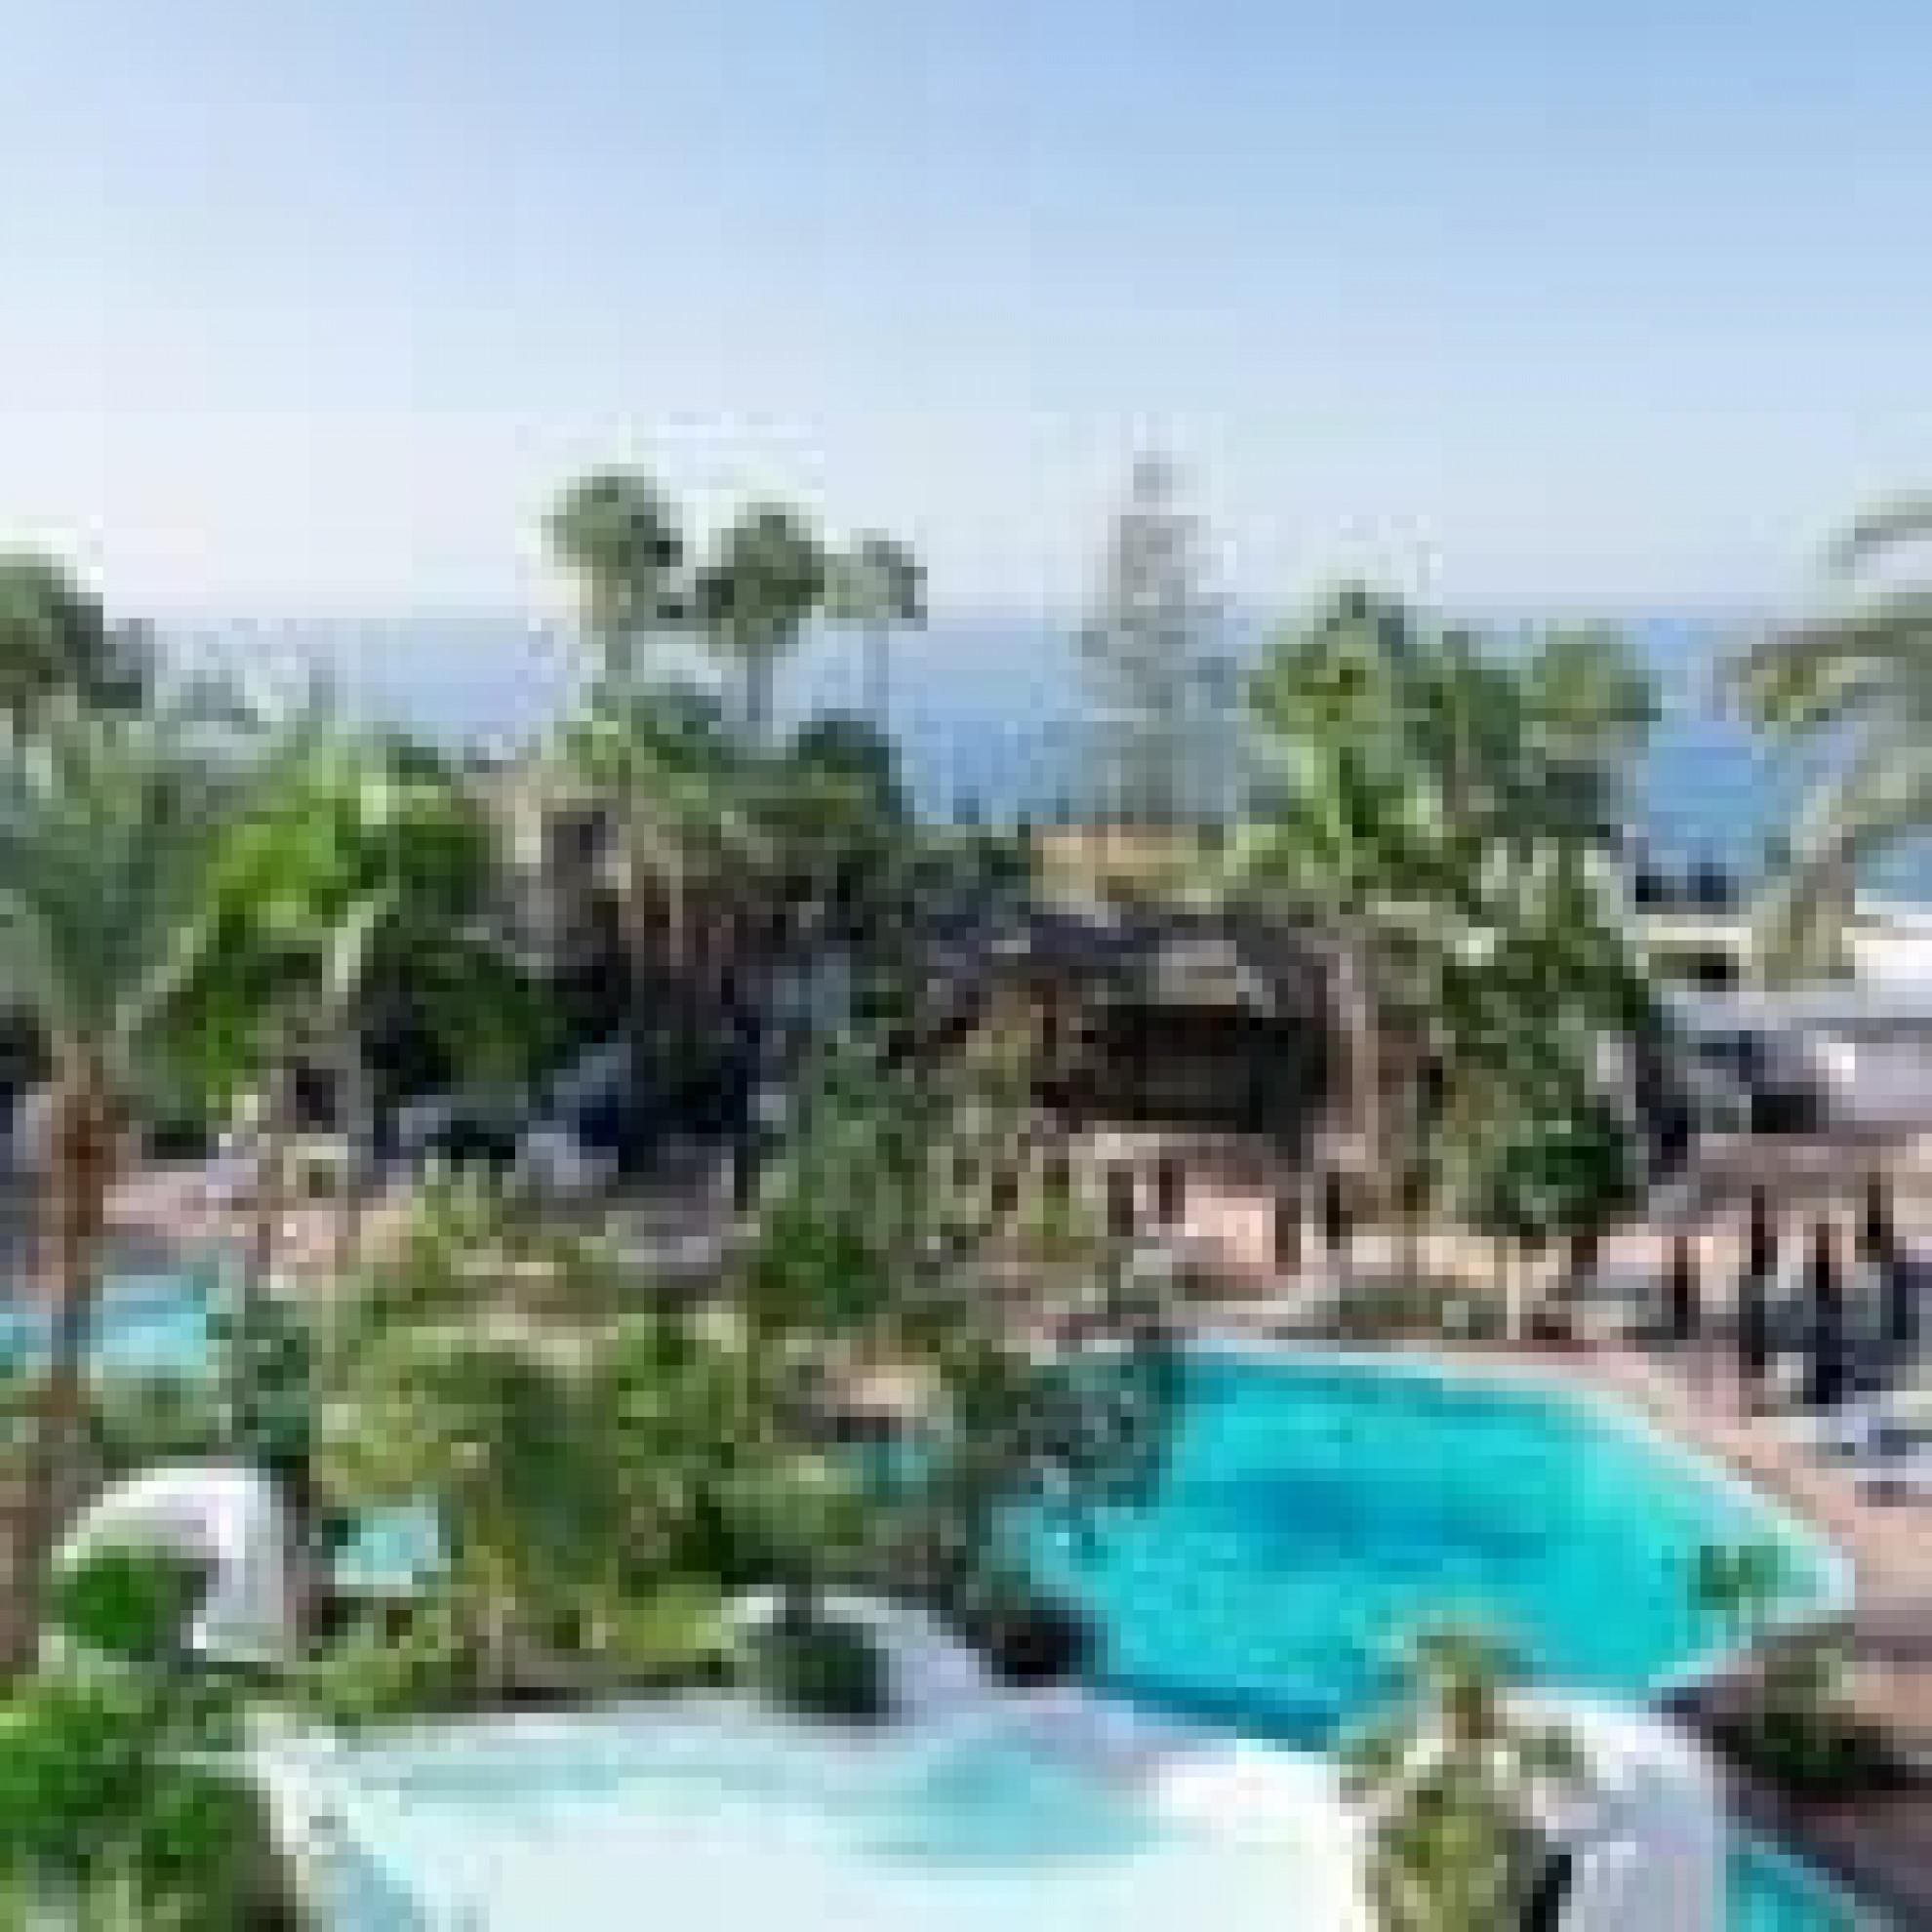 Hotel Jardin Tropical Coasta Adeje - Teneriffa - Green Golf